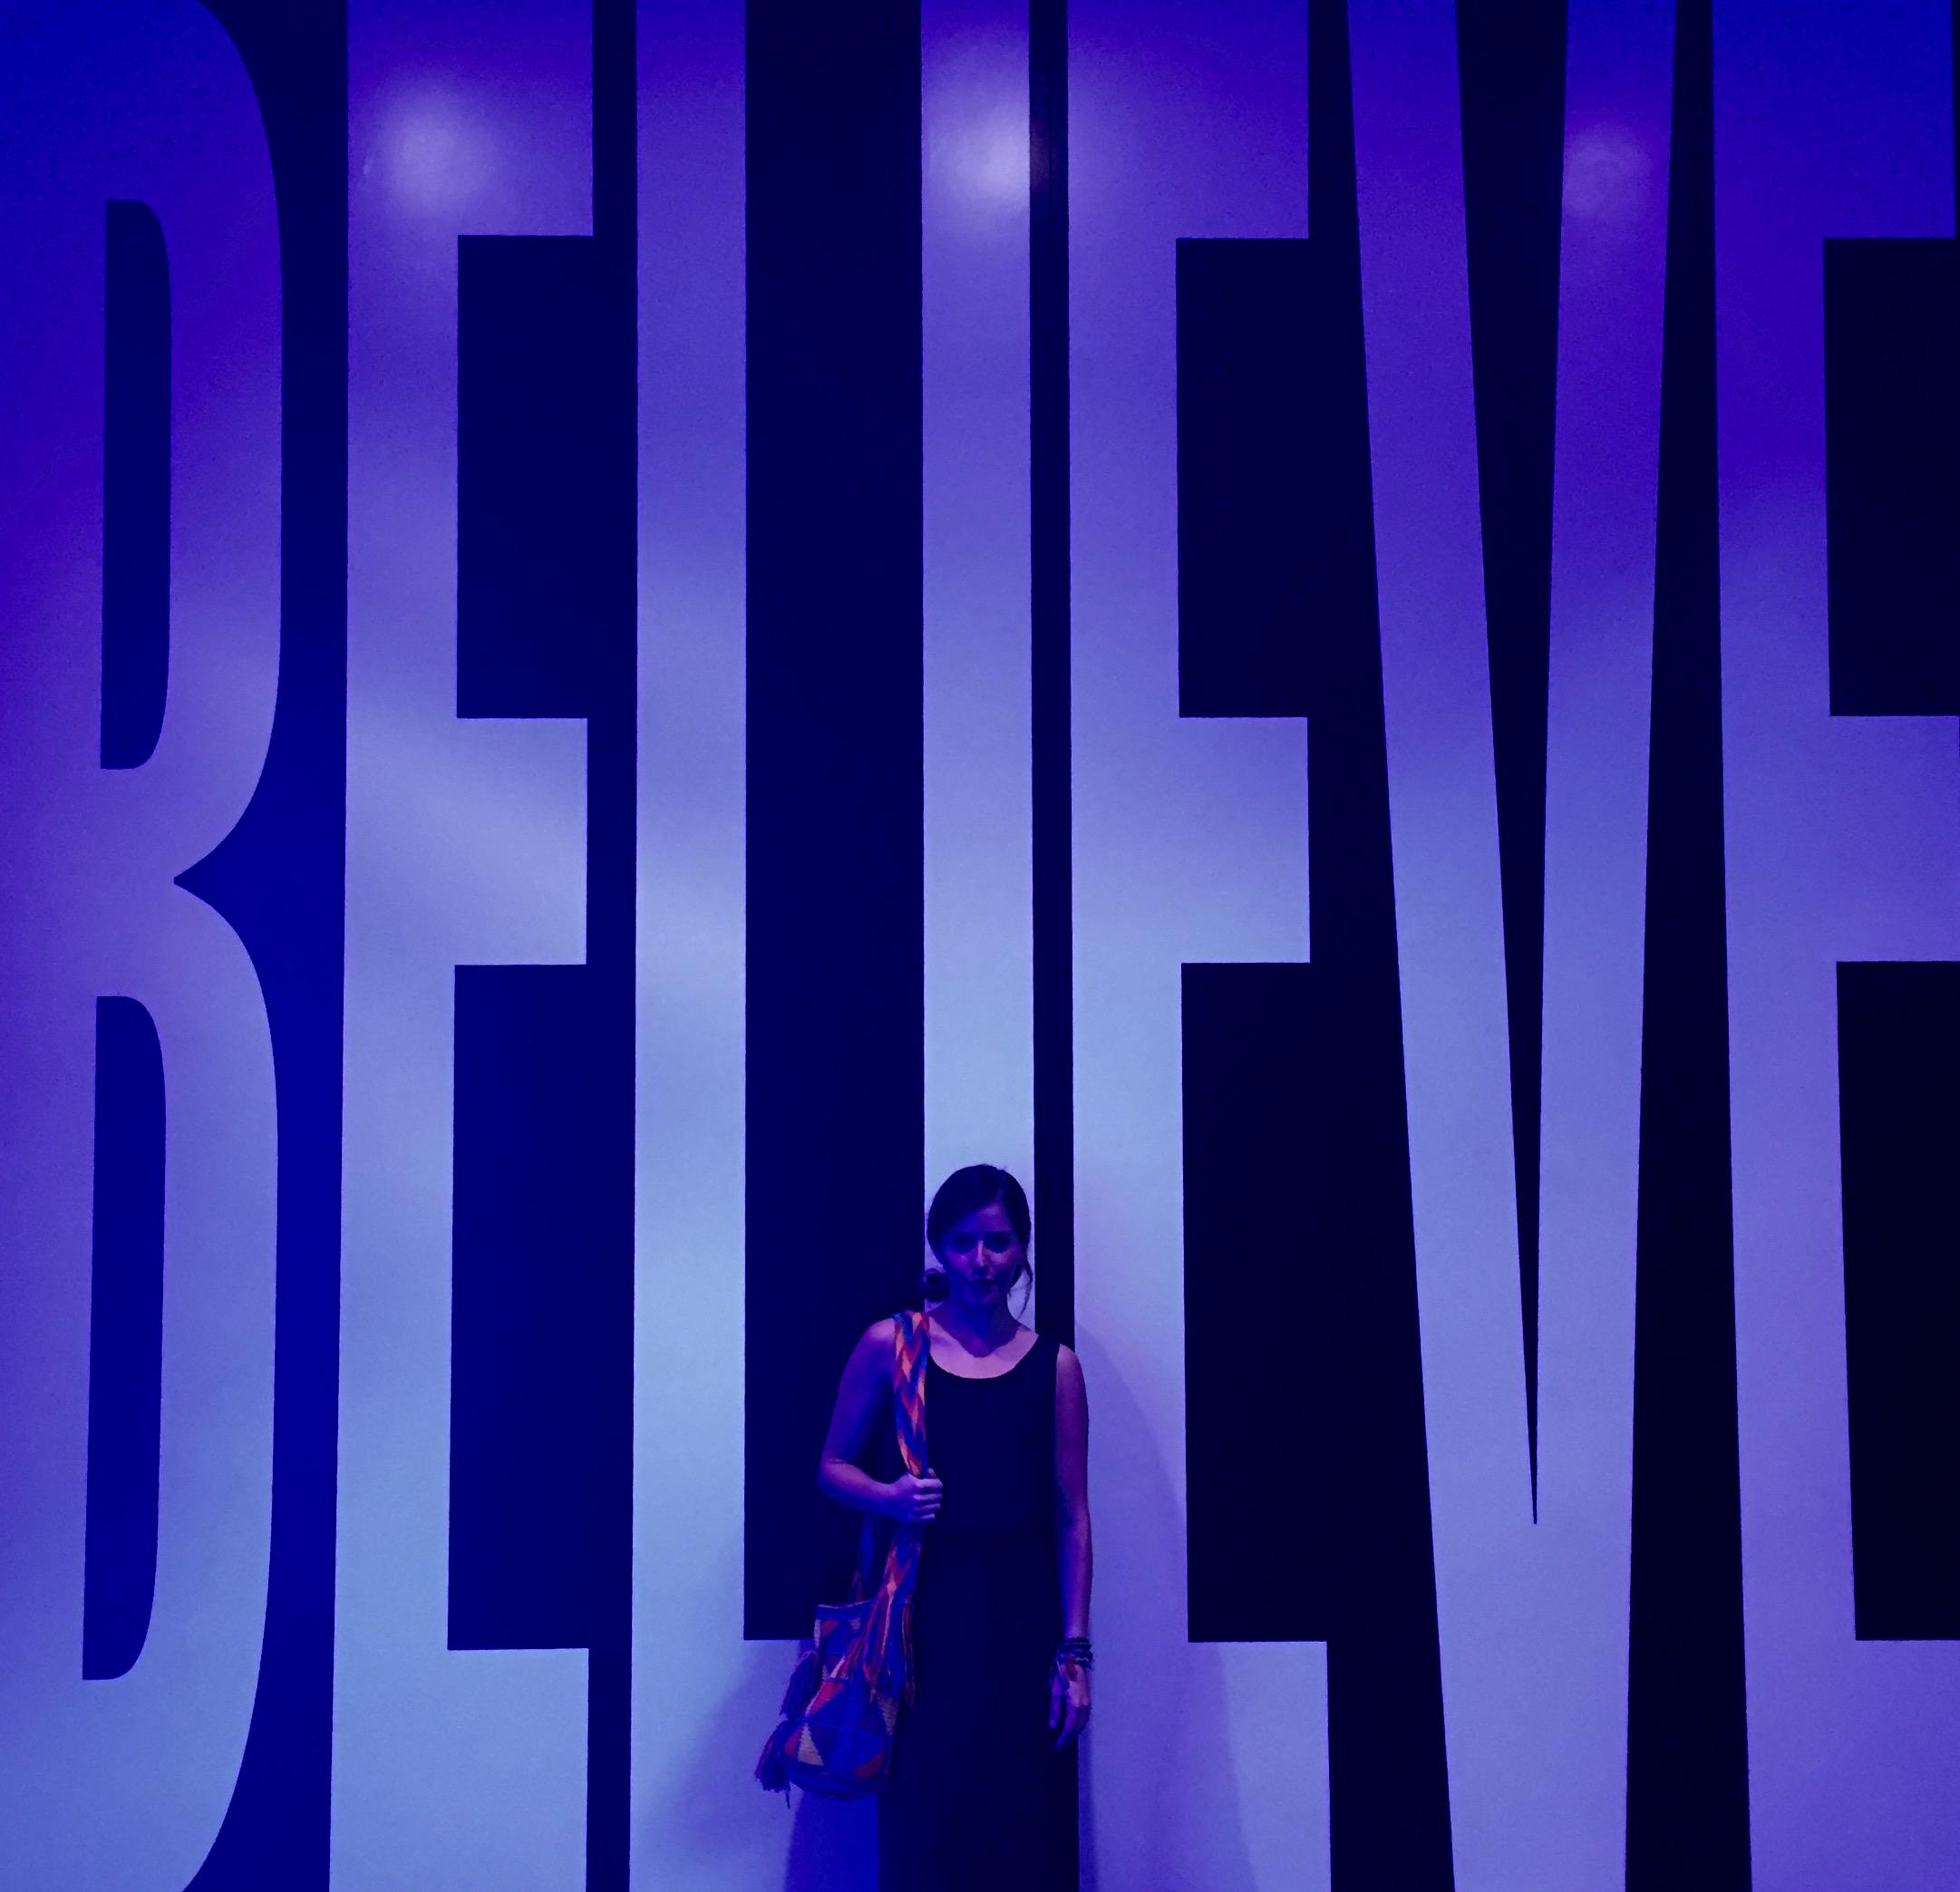 Belief and Doubt - Barbara Kruger